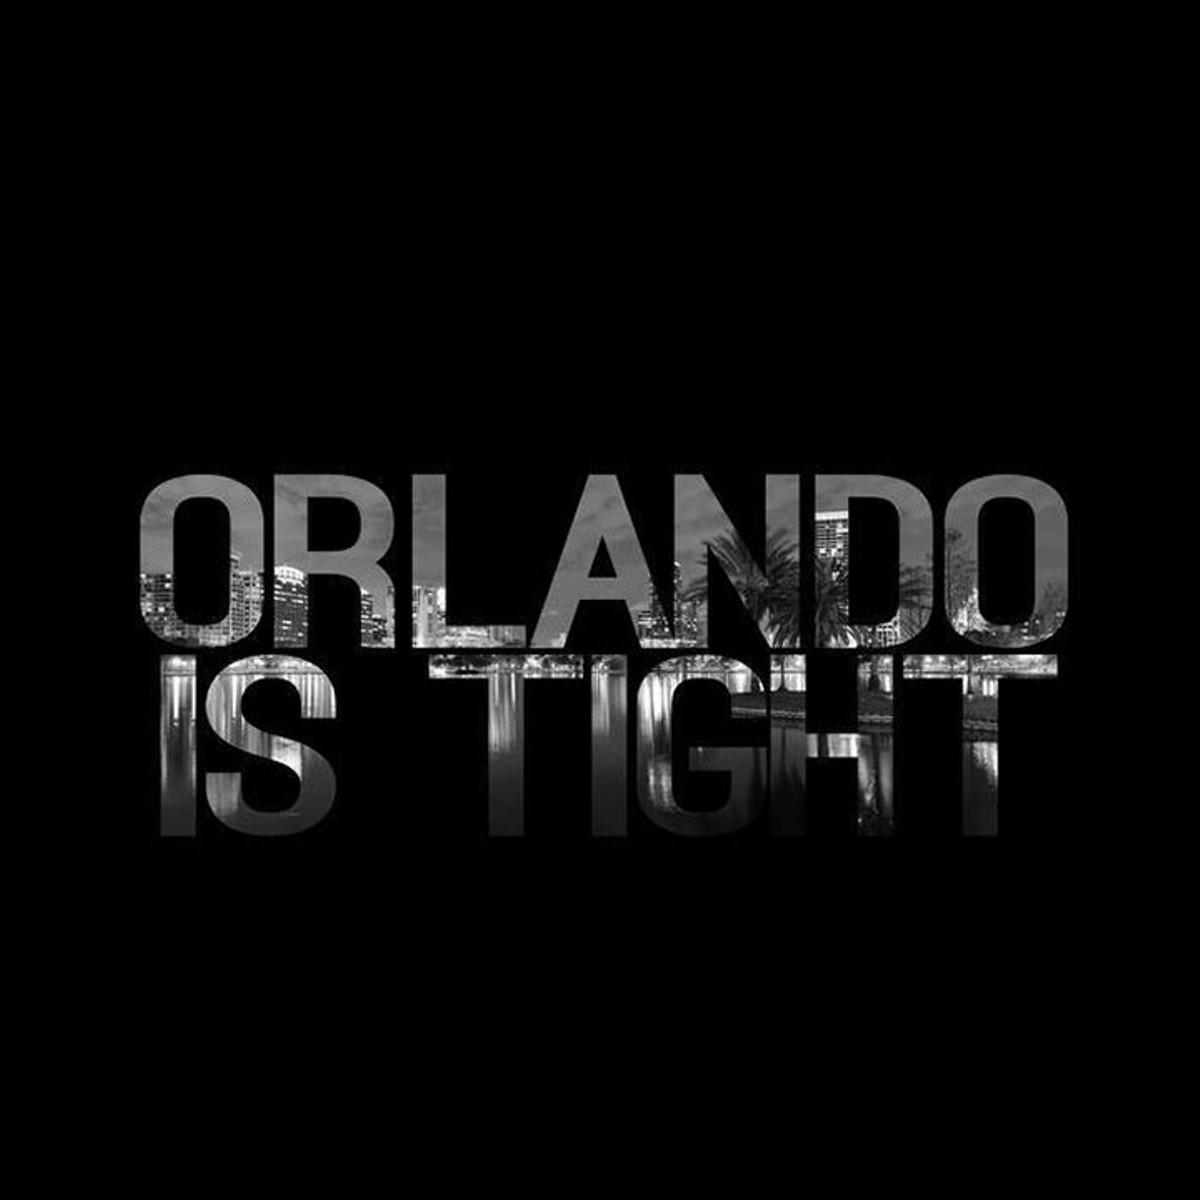 gal_orlando_is_tight.jpg